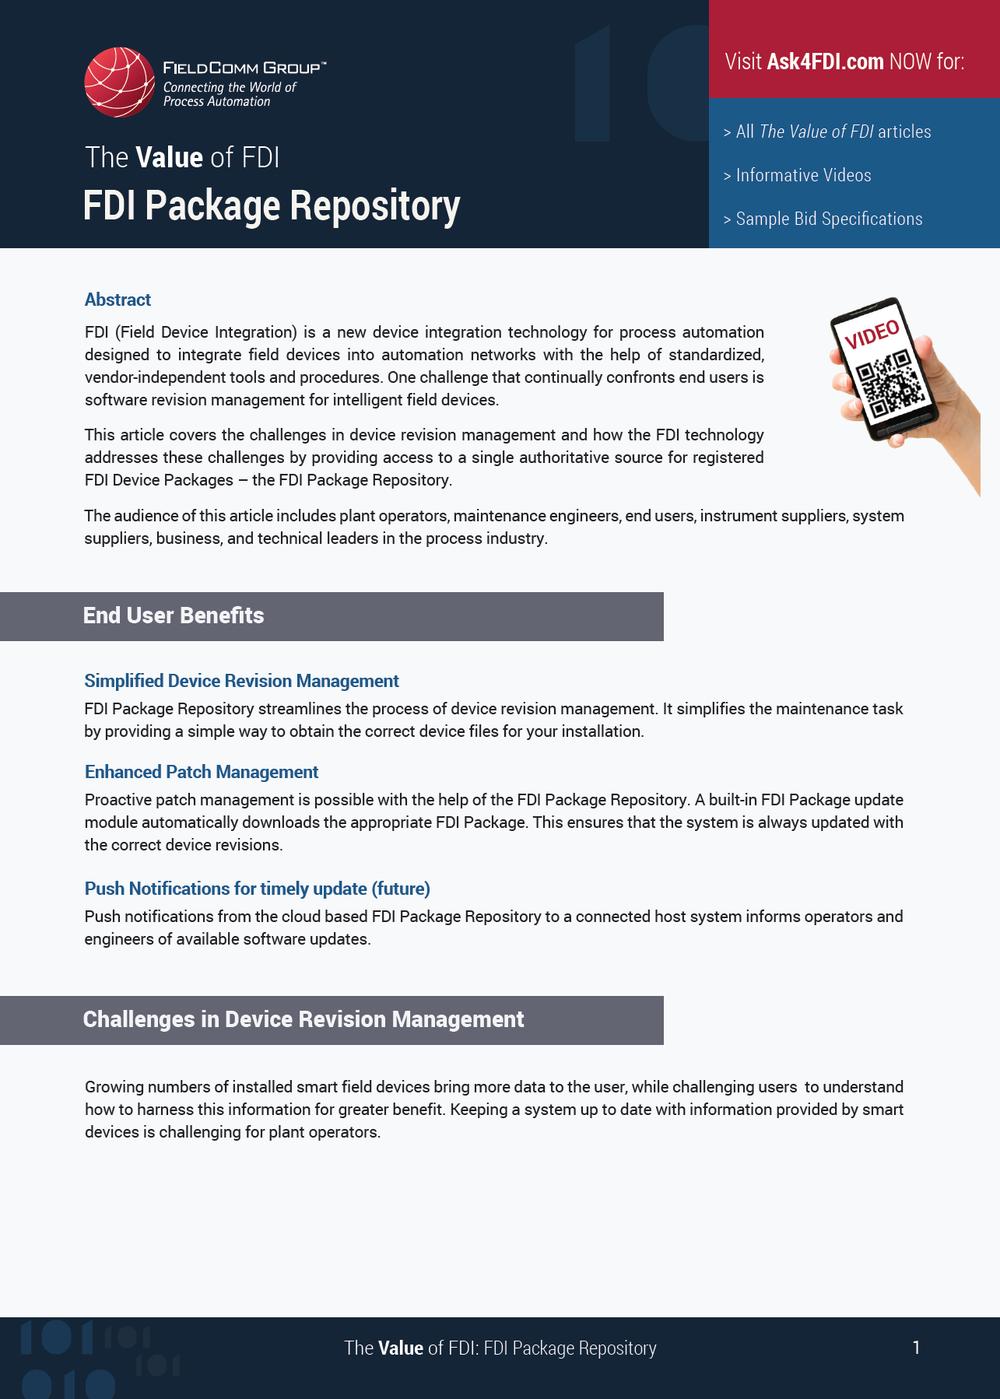 FDI Package Repository -